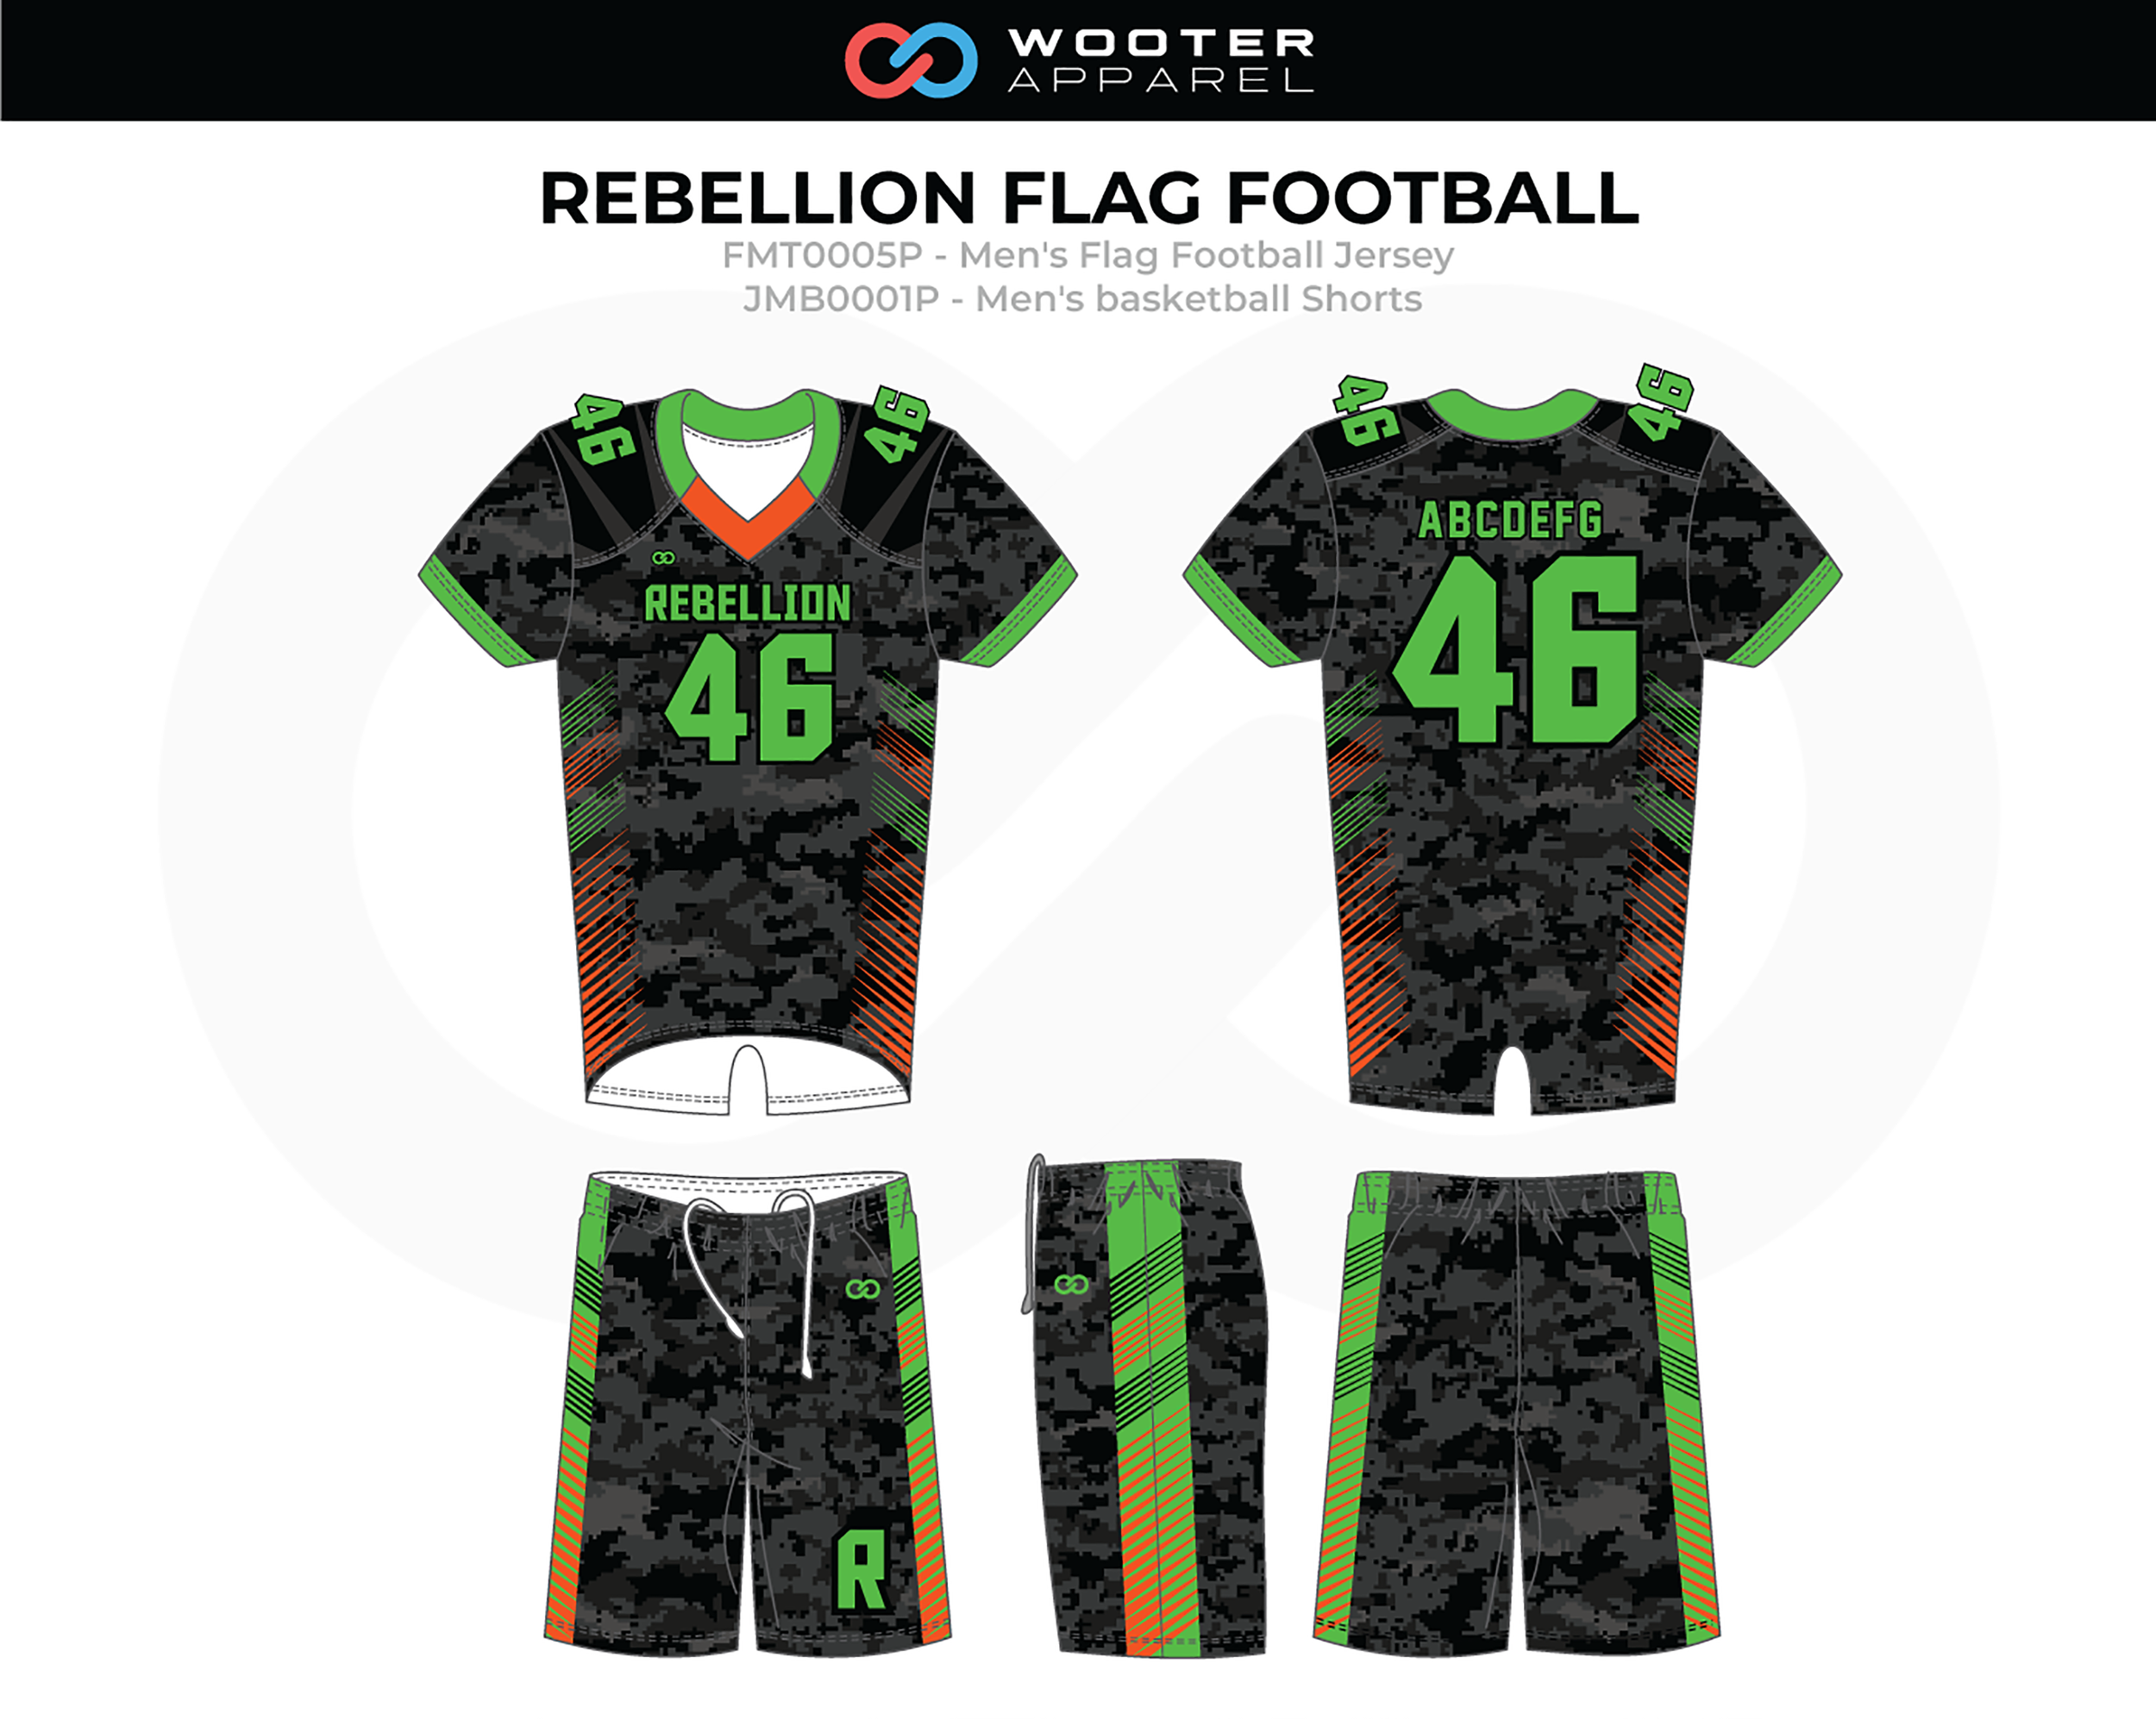 RebellionFlagFootball_MockupV2.png